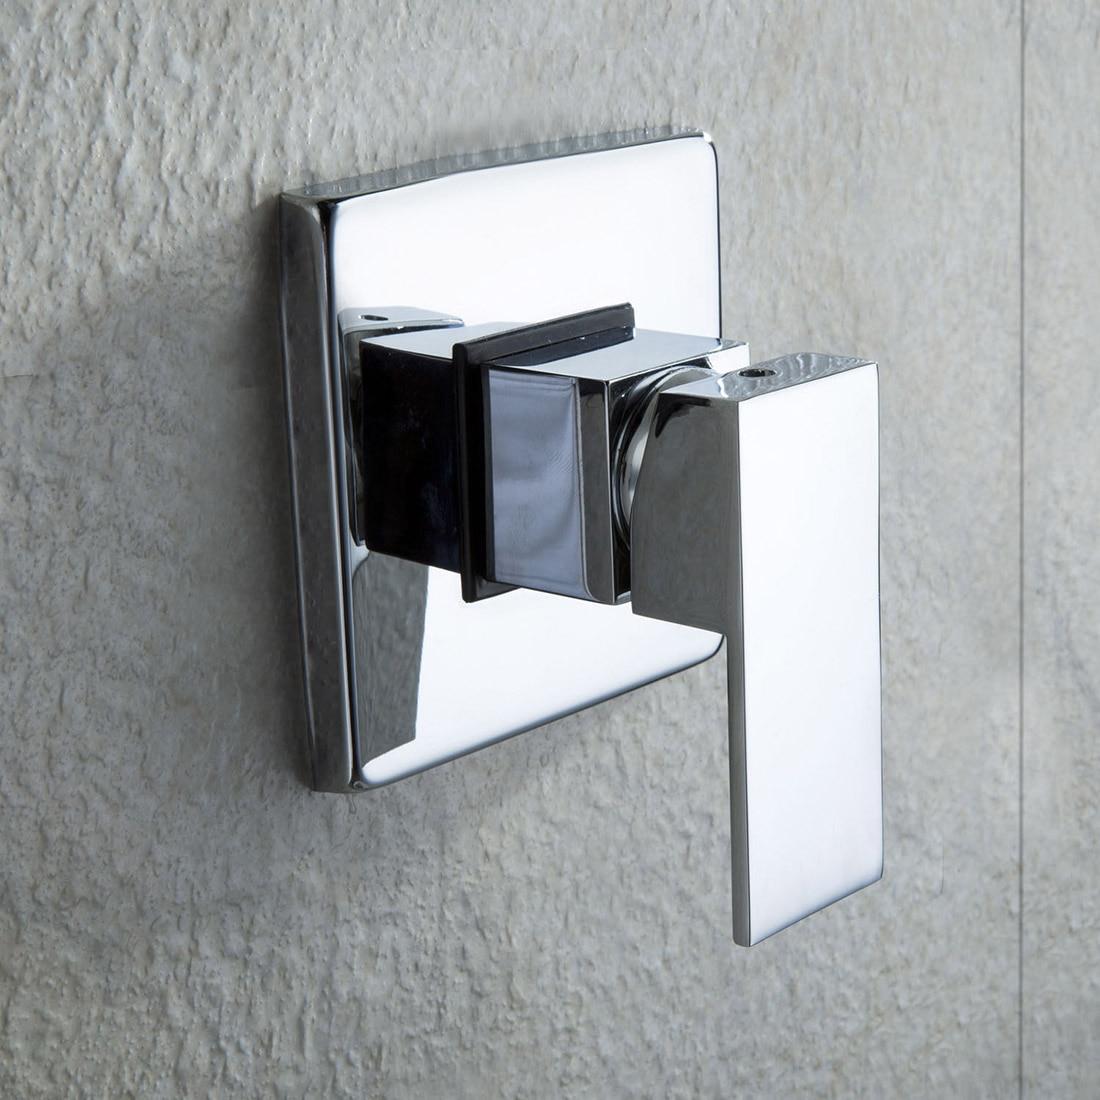 Promotion! 8 single handle Chrome wall mounted brass rain shower faucet setPromotion! 8 single handle Chrome wall mounted brass rain shower faucet set